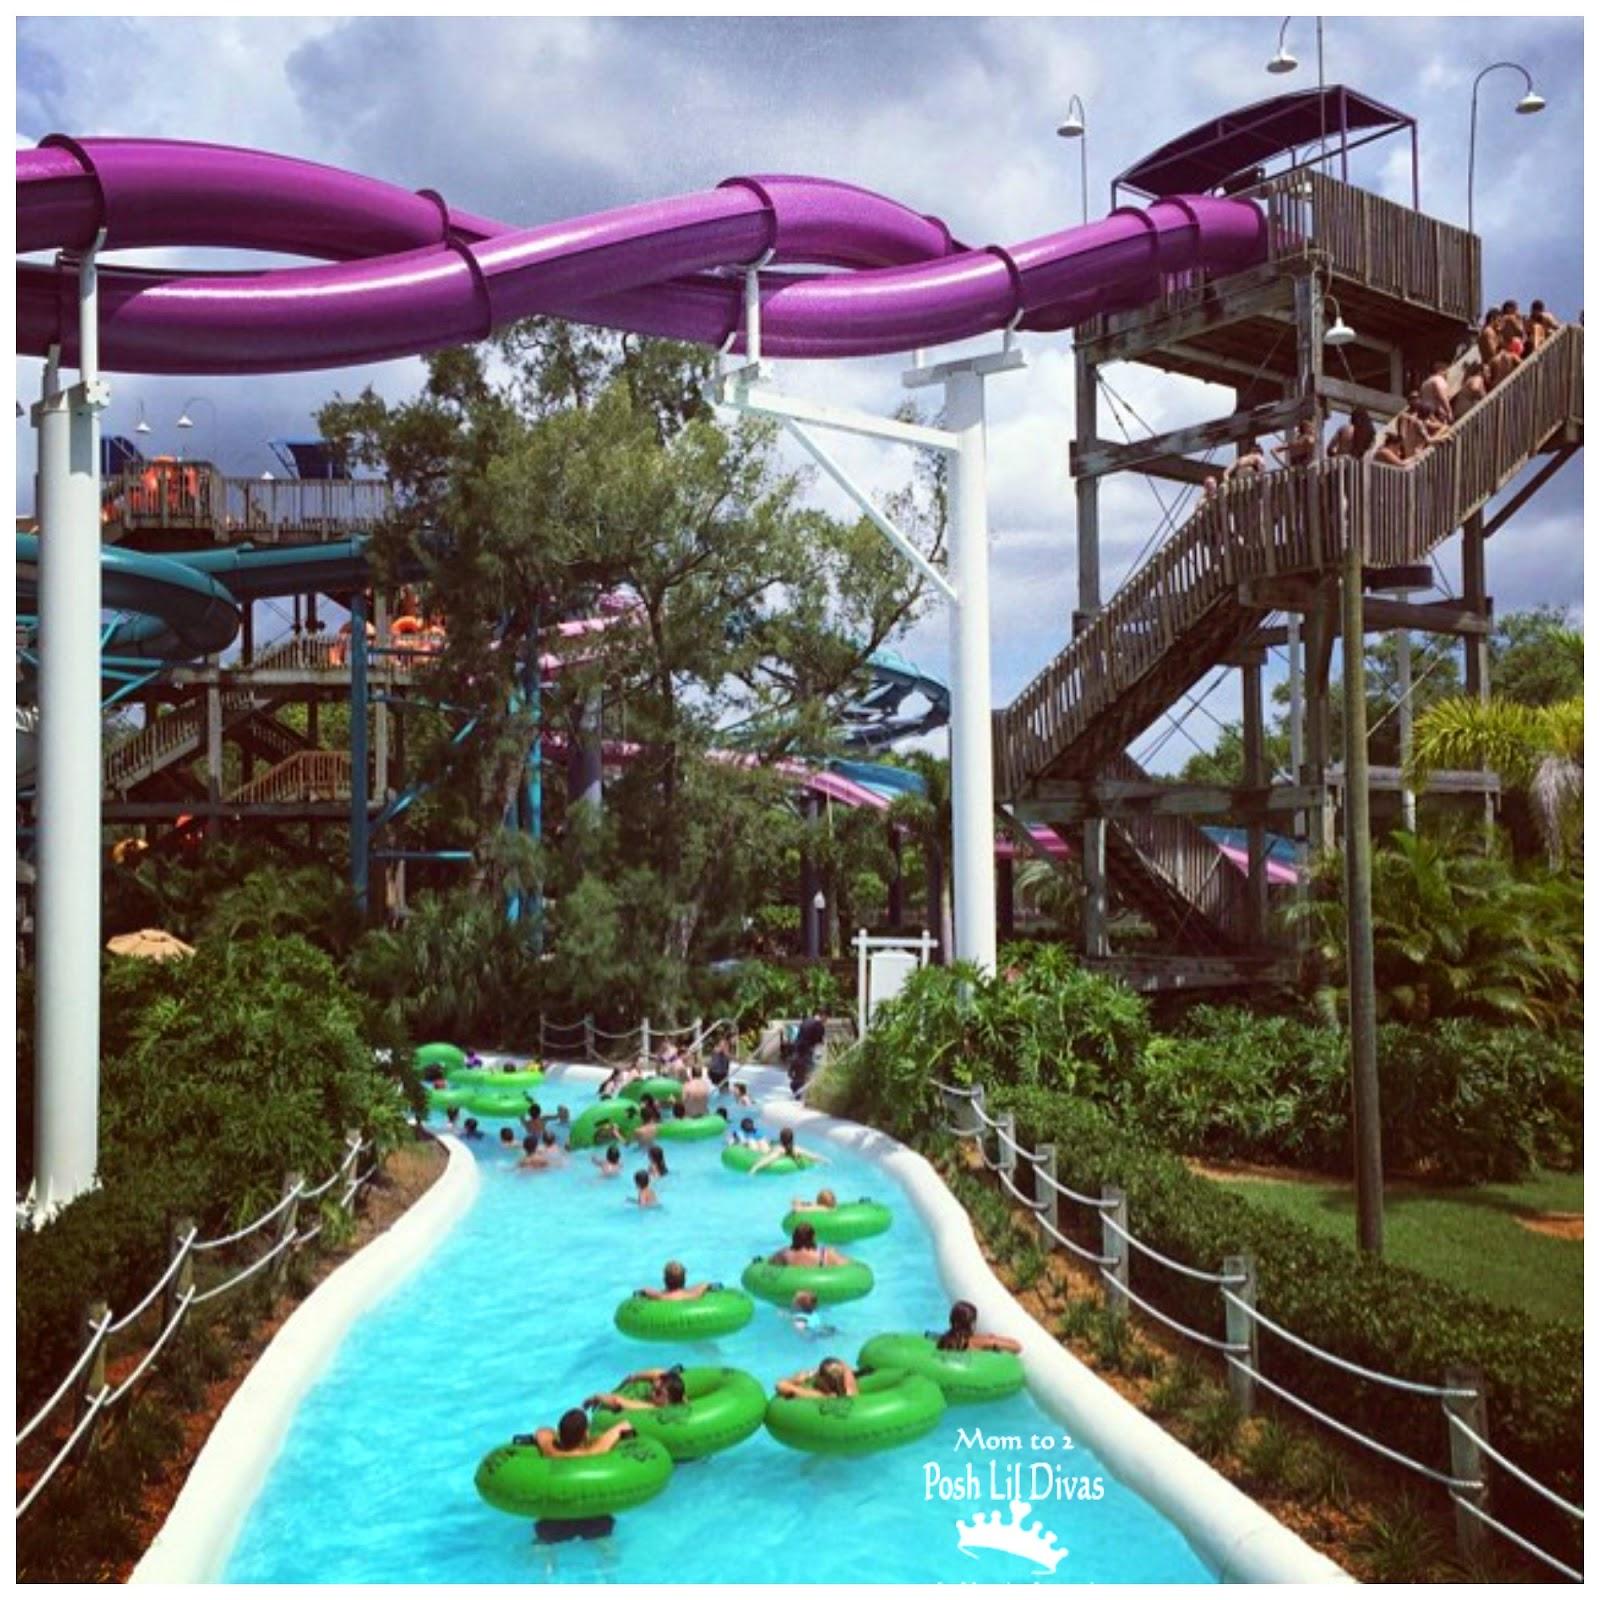 Adventure Island Tampa: Adventure Island Water Park Fun (Tampa, Florida